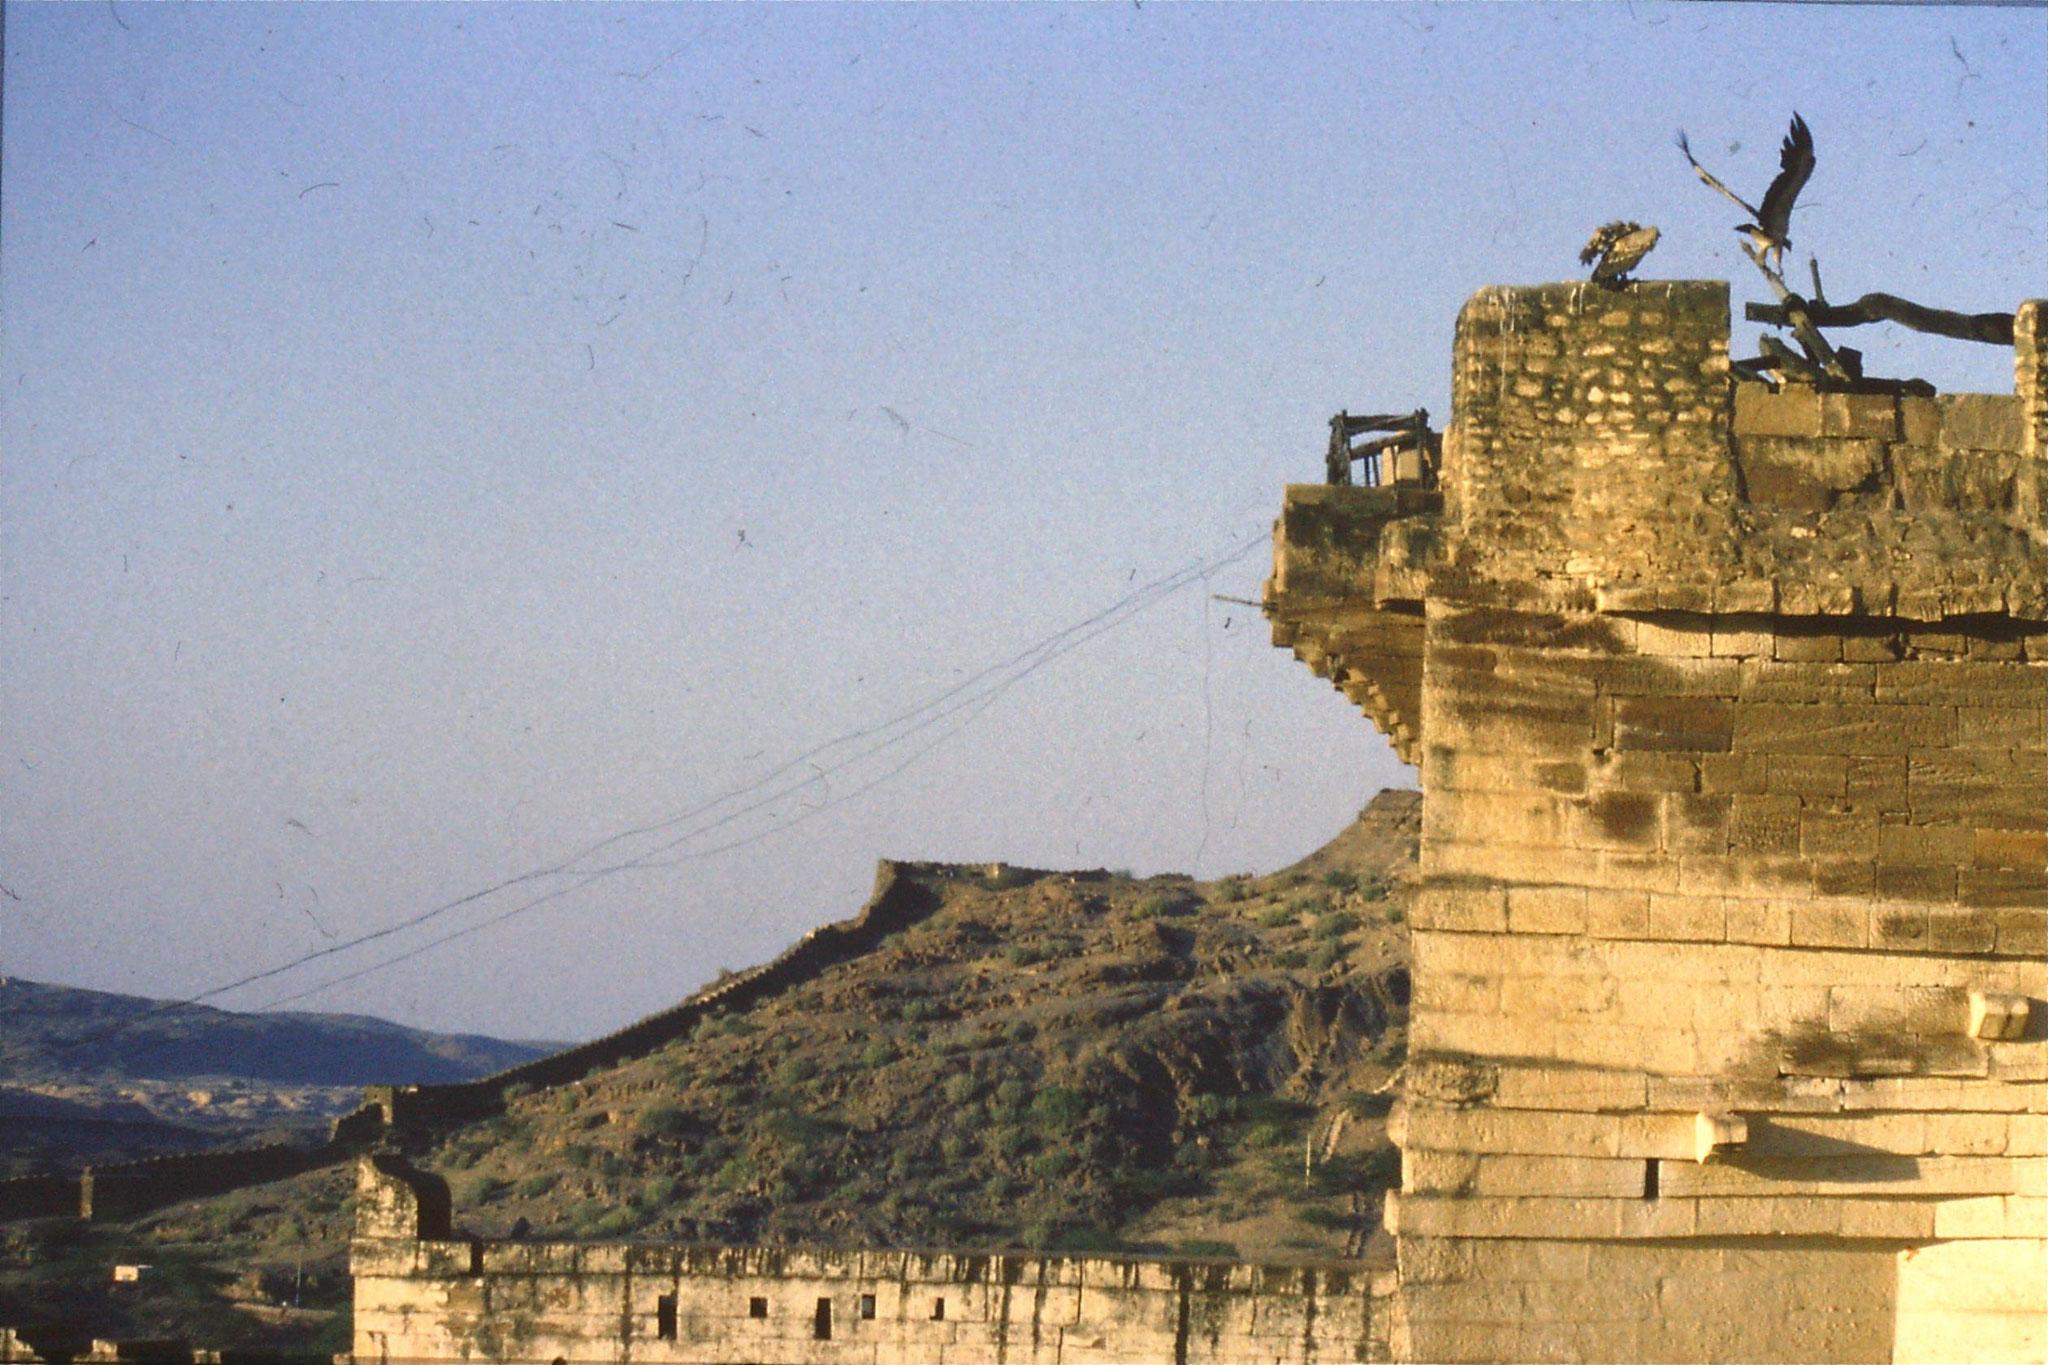 28/11/1989: 1: Jodhpur Red Fort vultures